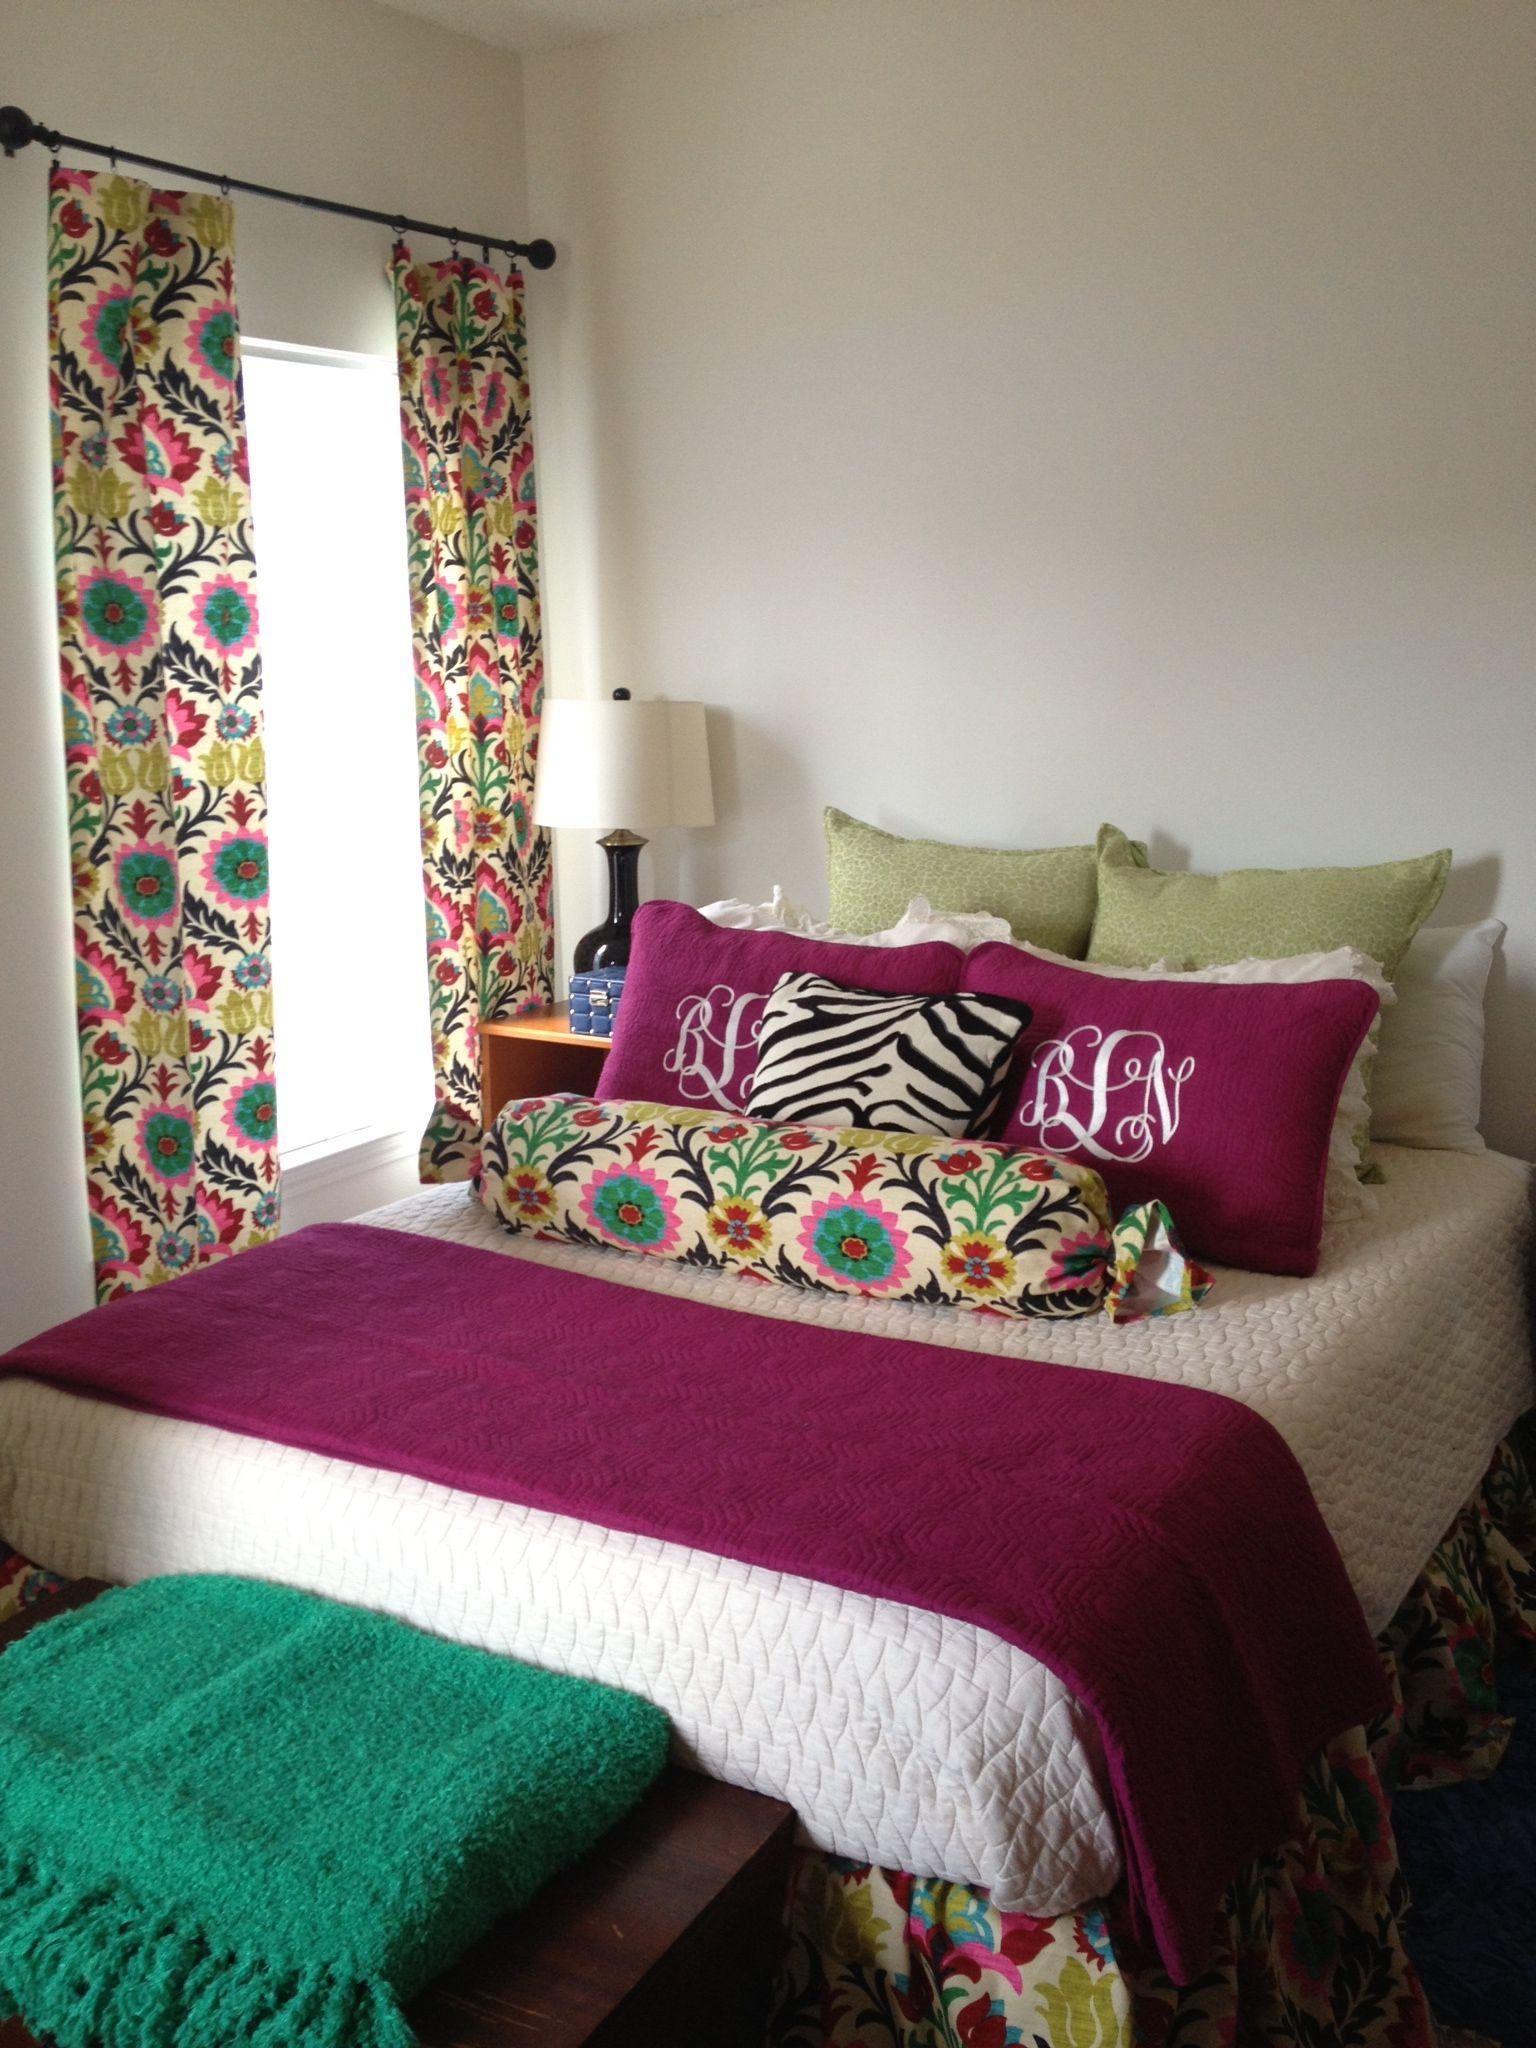 Jewel Tone Bedroom Decorations Using Waverly Santa Maria Fabric In